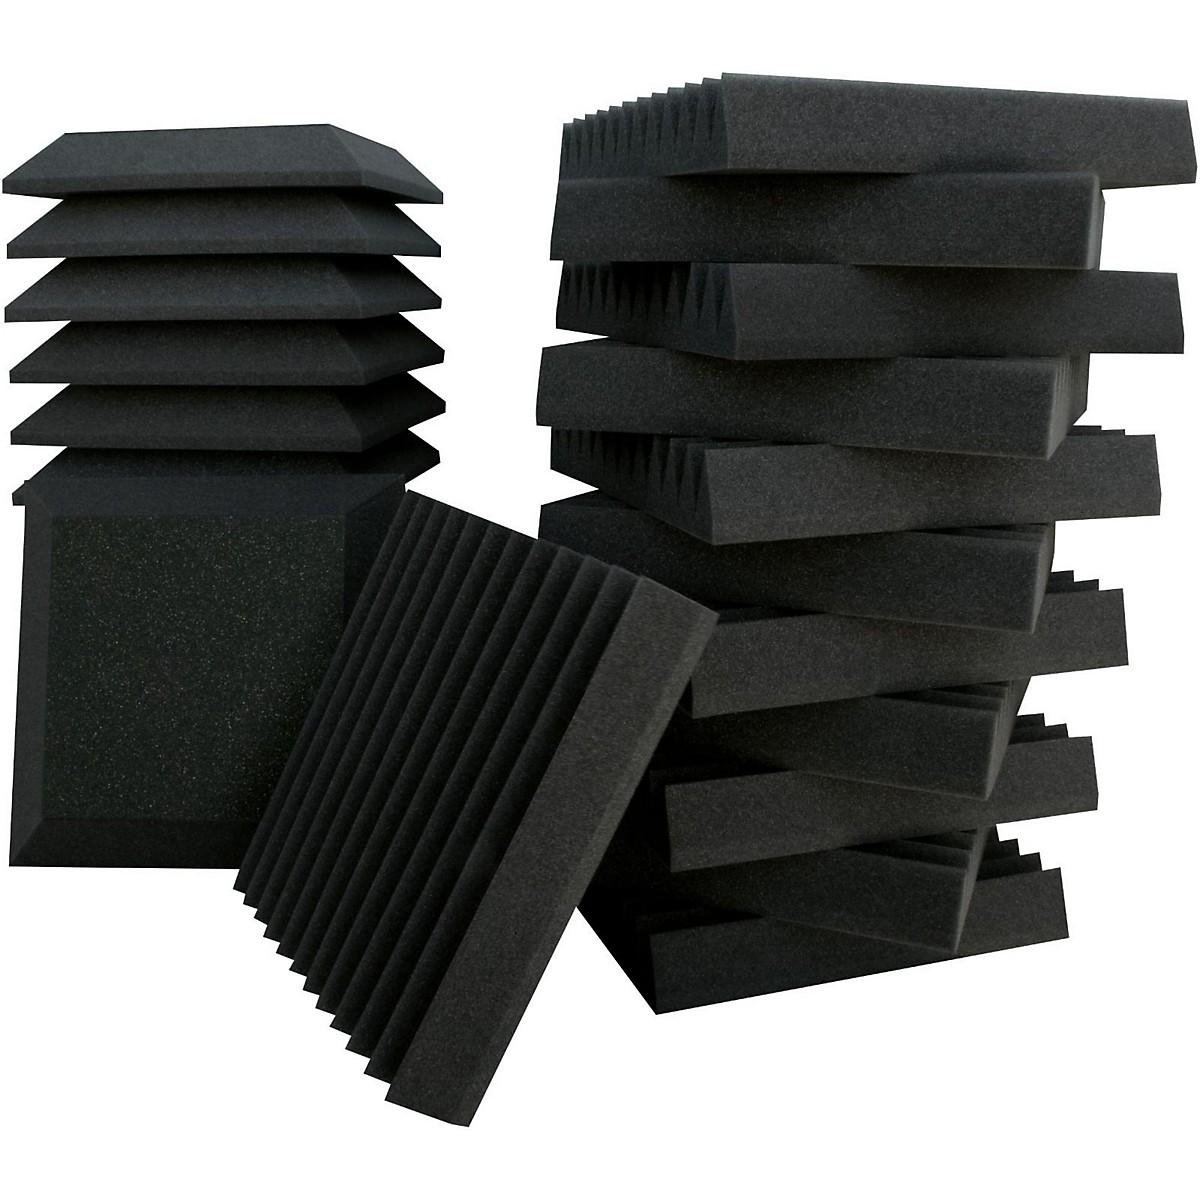 Ultimate Acoustics Studio Bundle II (24 Pack)